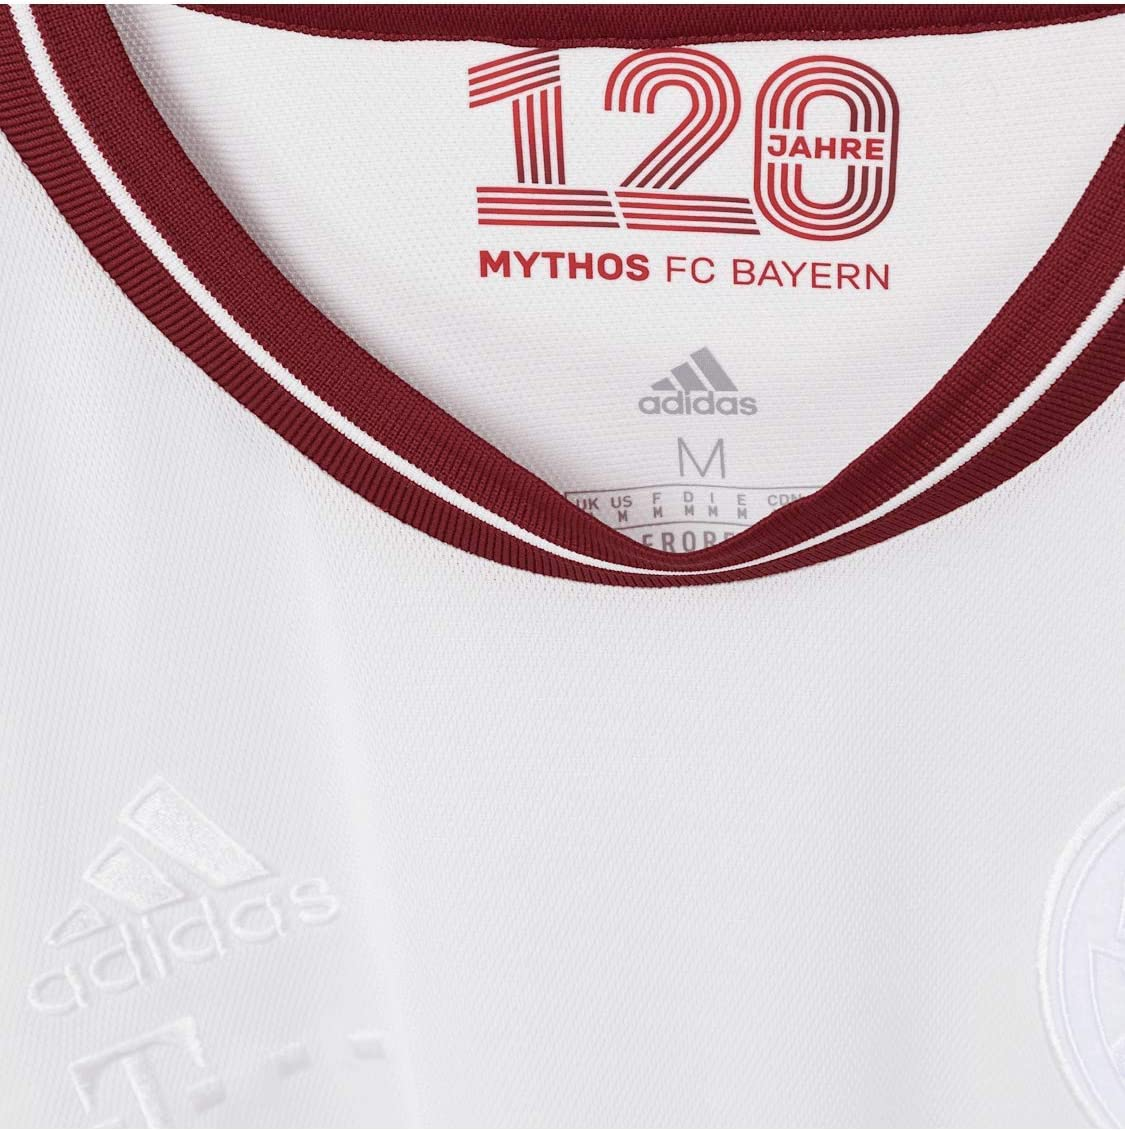 Sondertrikot zum Geburtstag FC Bayern Jubil/äumstrikot 120 Jahre